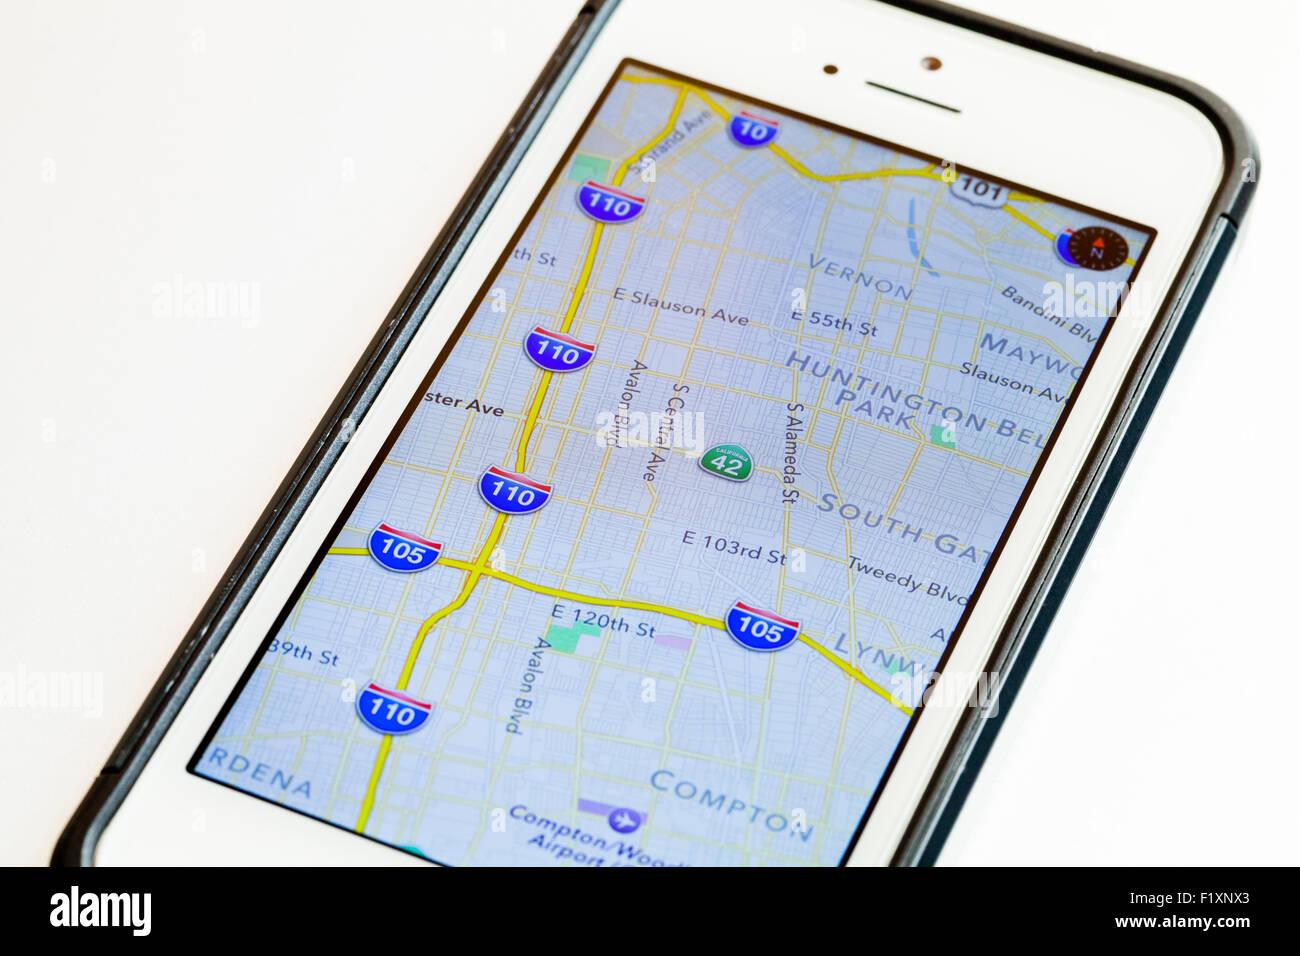 Google Maps auf dem iPhone Bildschirm - USA Stockfoto, Bild ...